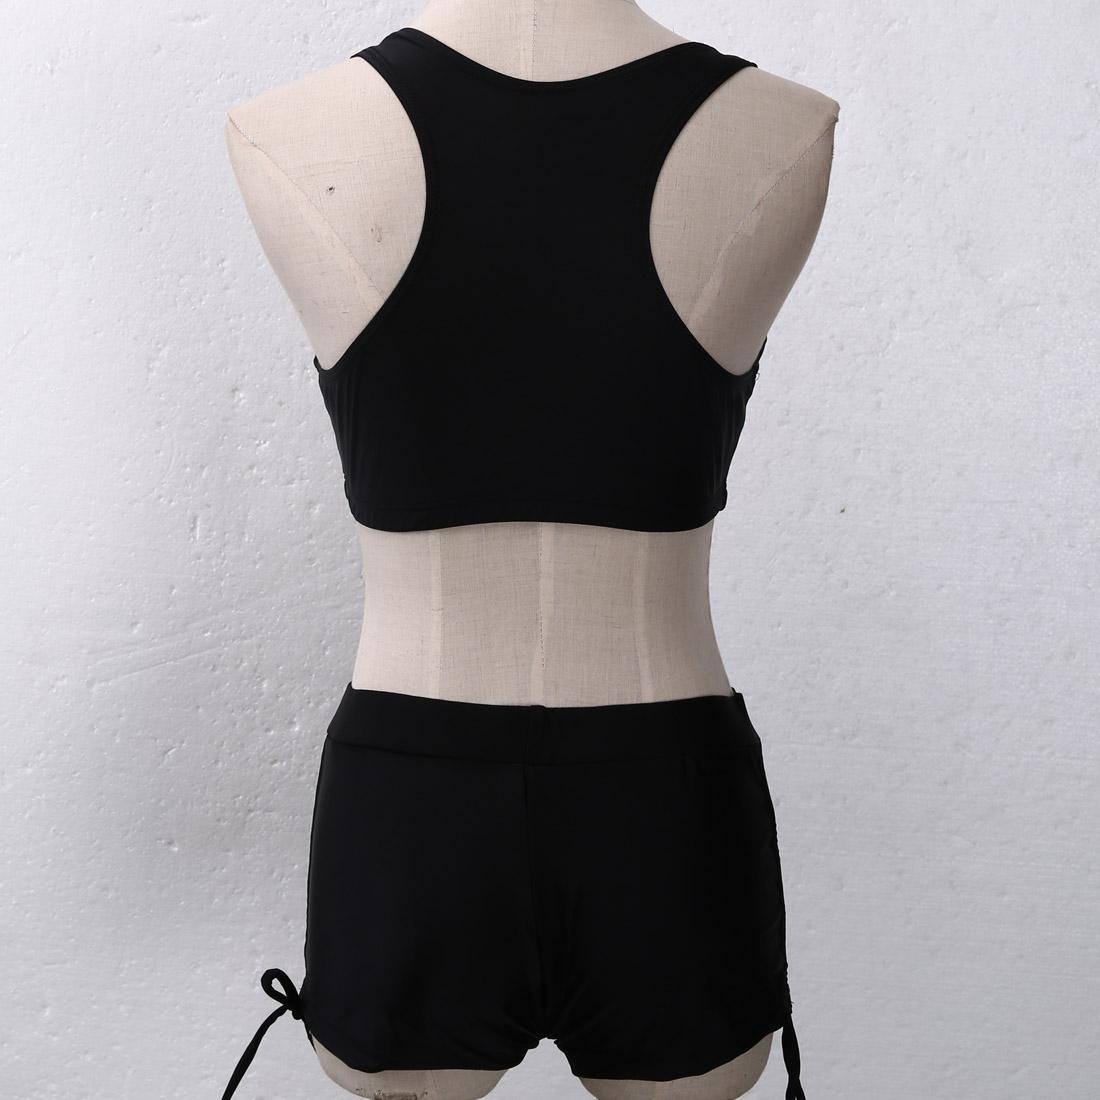 2019 Nova Mulheres Swimwear Push Up Imprimir Bikini Set Swimwear Bandage Hight cintura Swimsuit Praia maiô sexy Praia Outwear Nova